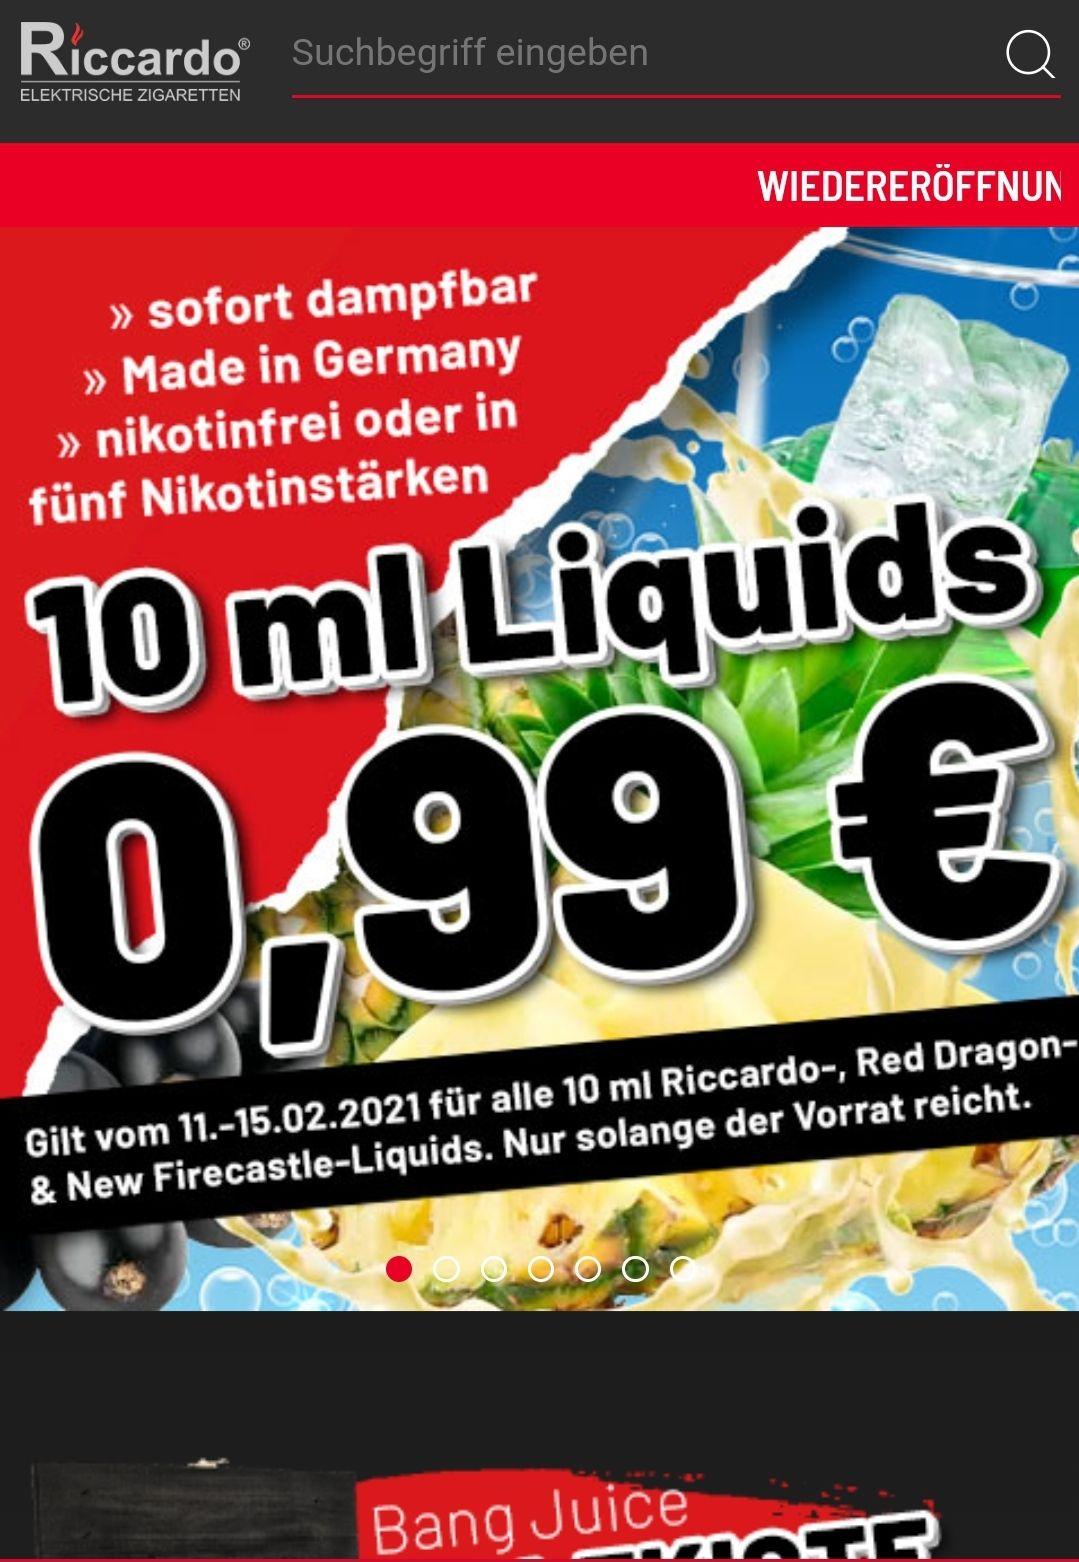 Riccardo e-zigarette bietet liquid von Red Dragon liquids für 0.99€